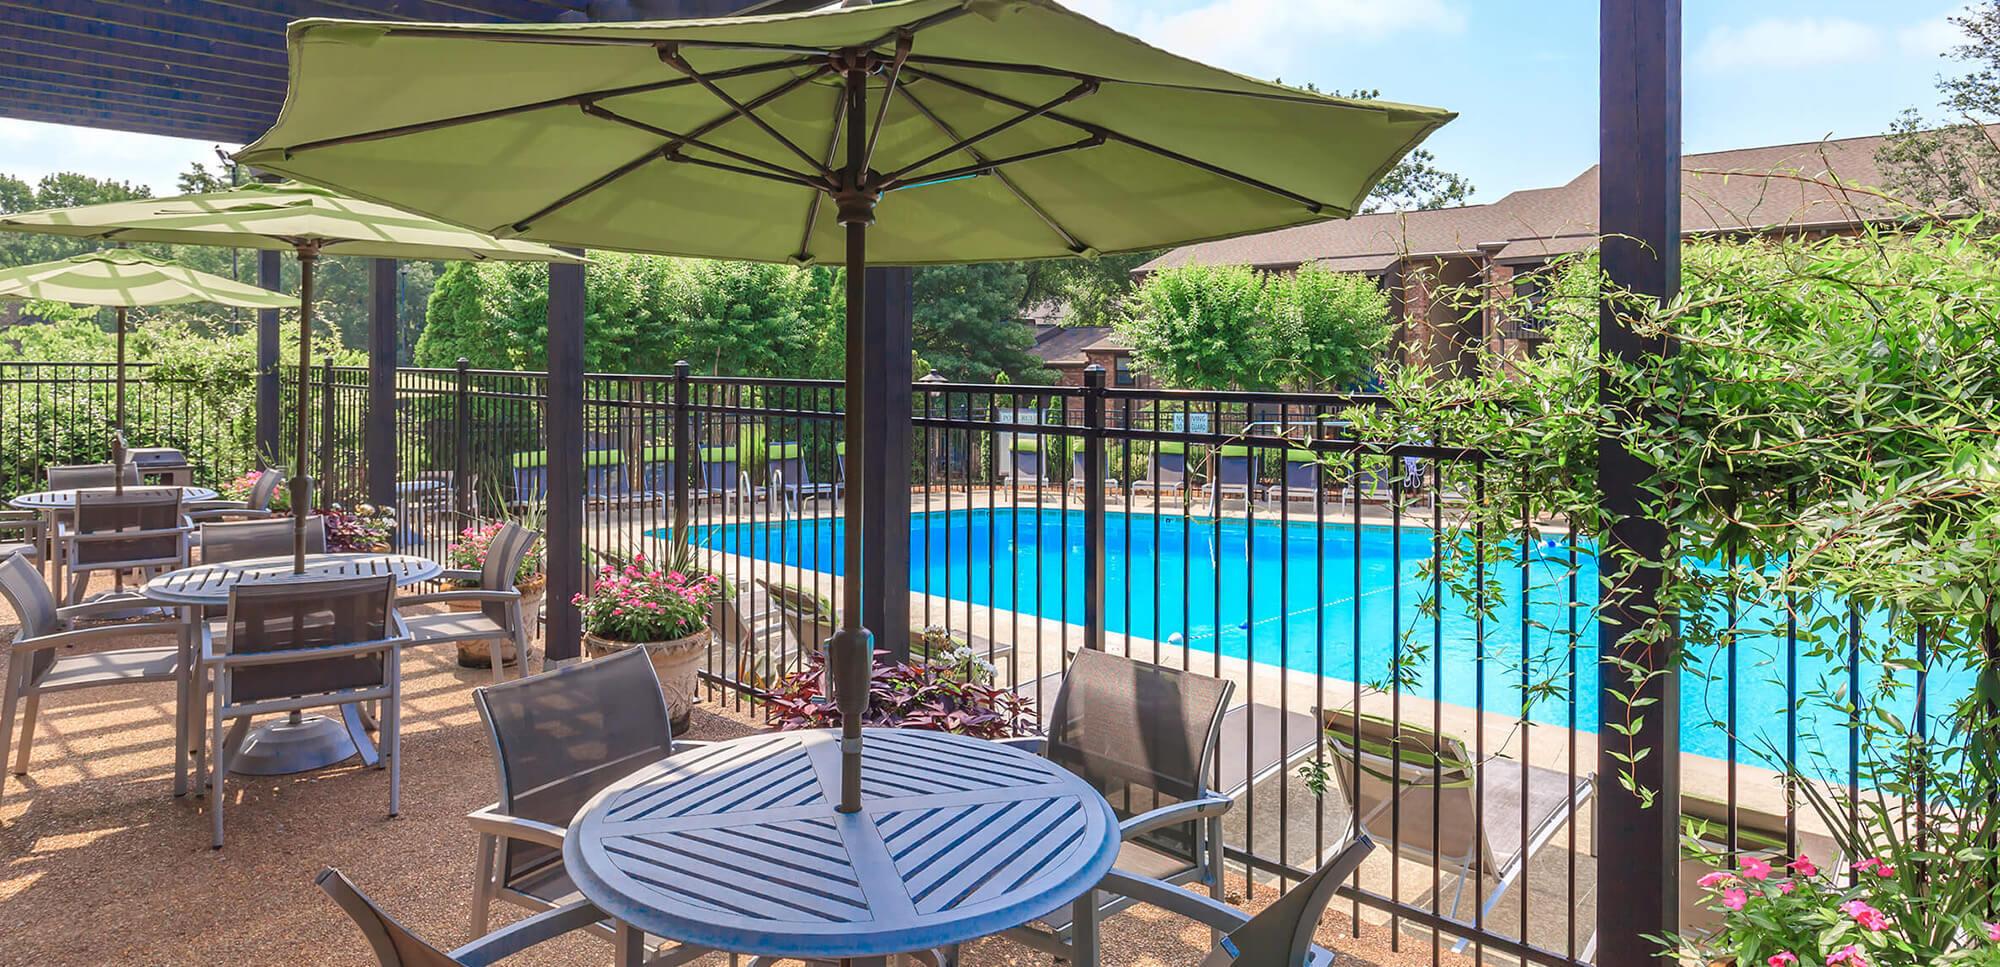 Gazebo Apartments - Apartments in Nashville, TN